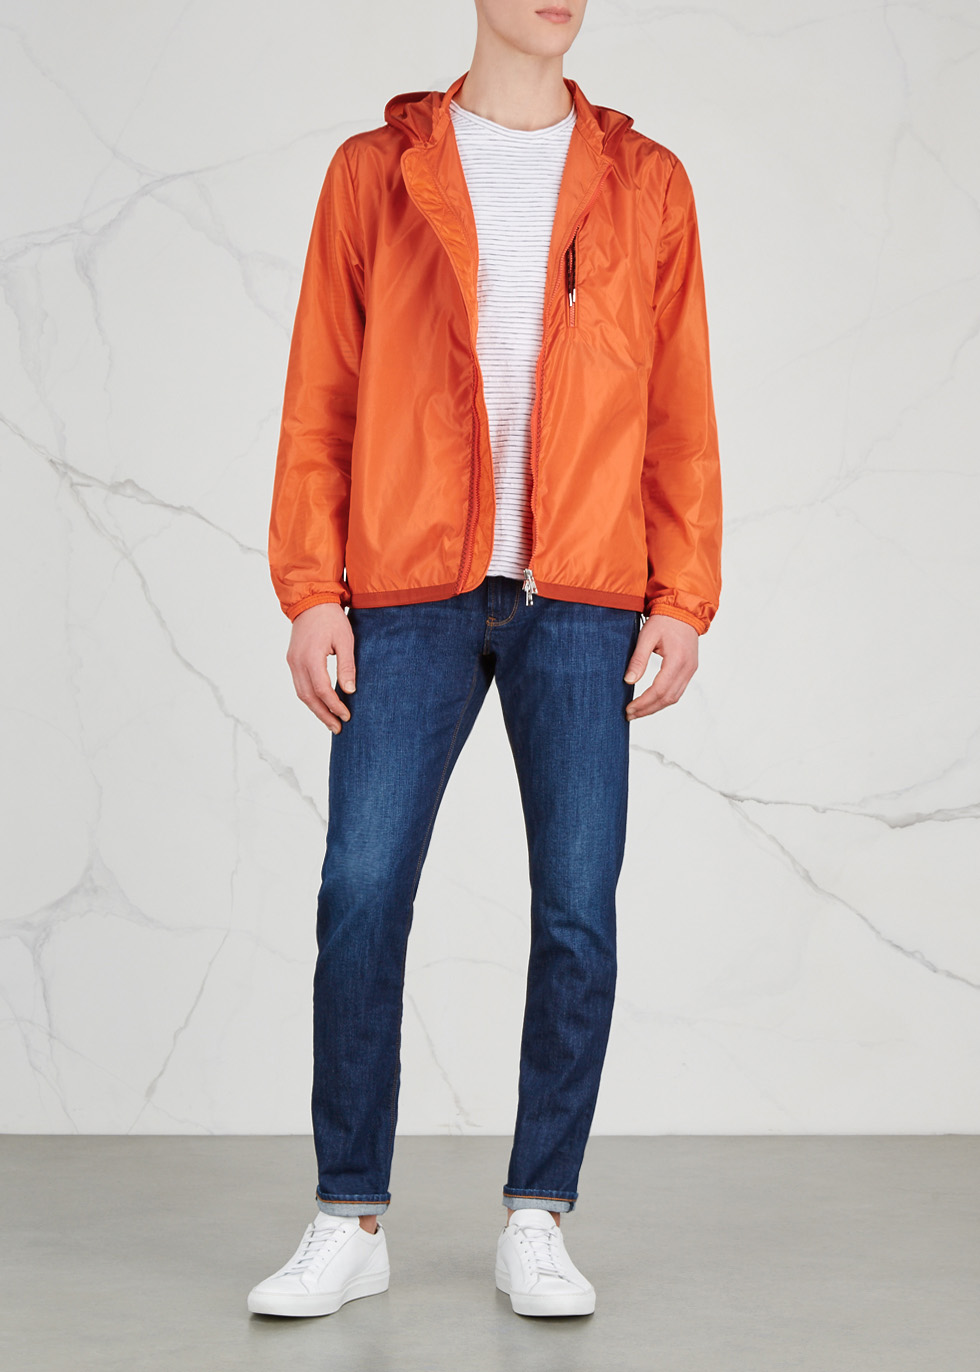 moncler jacket orange